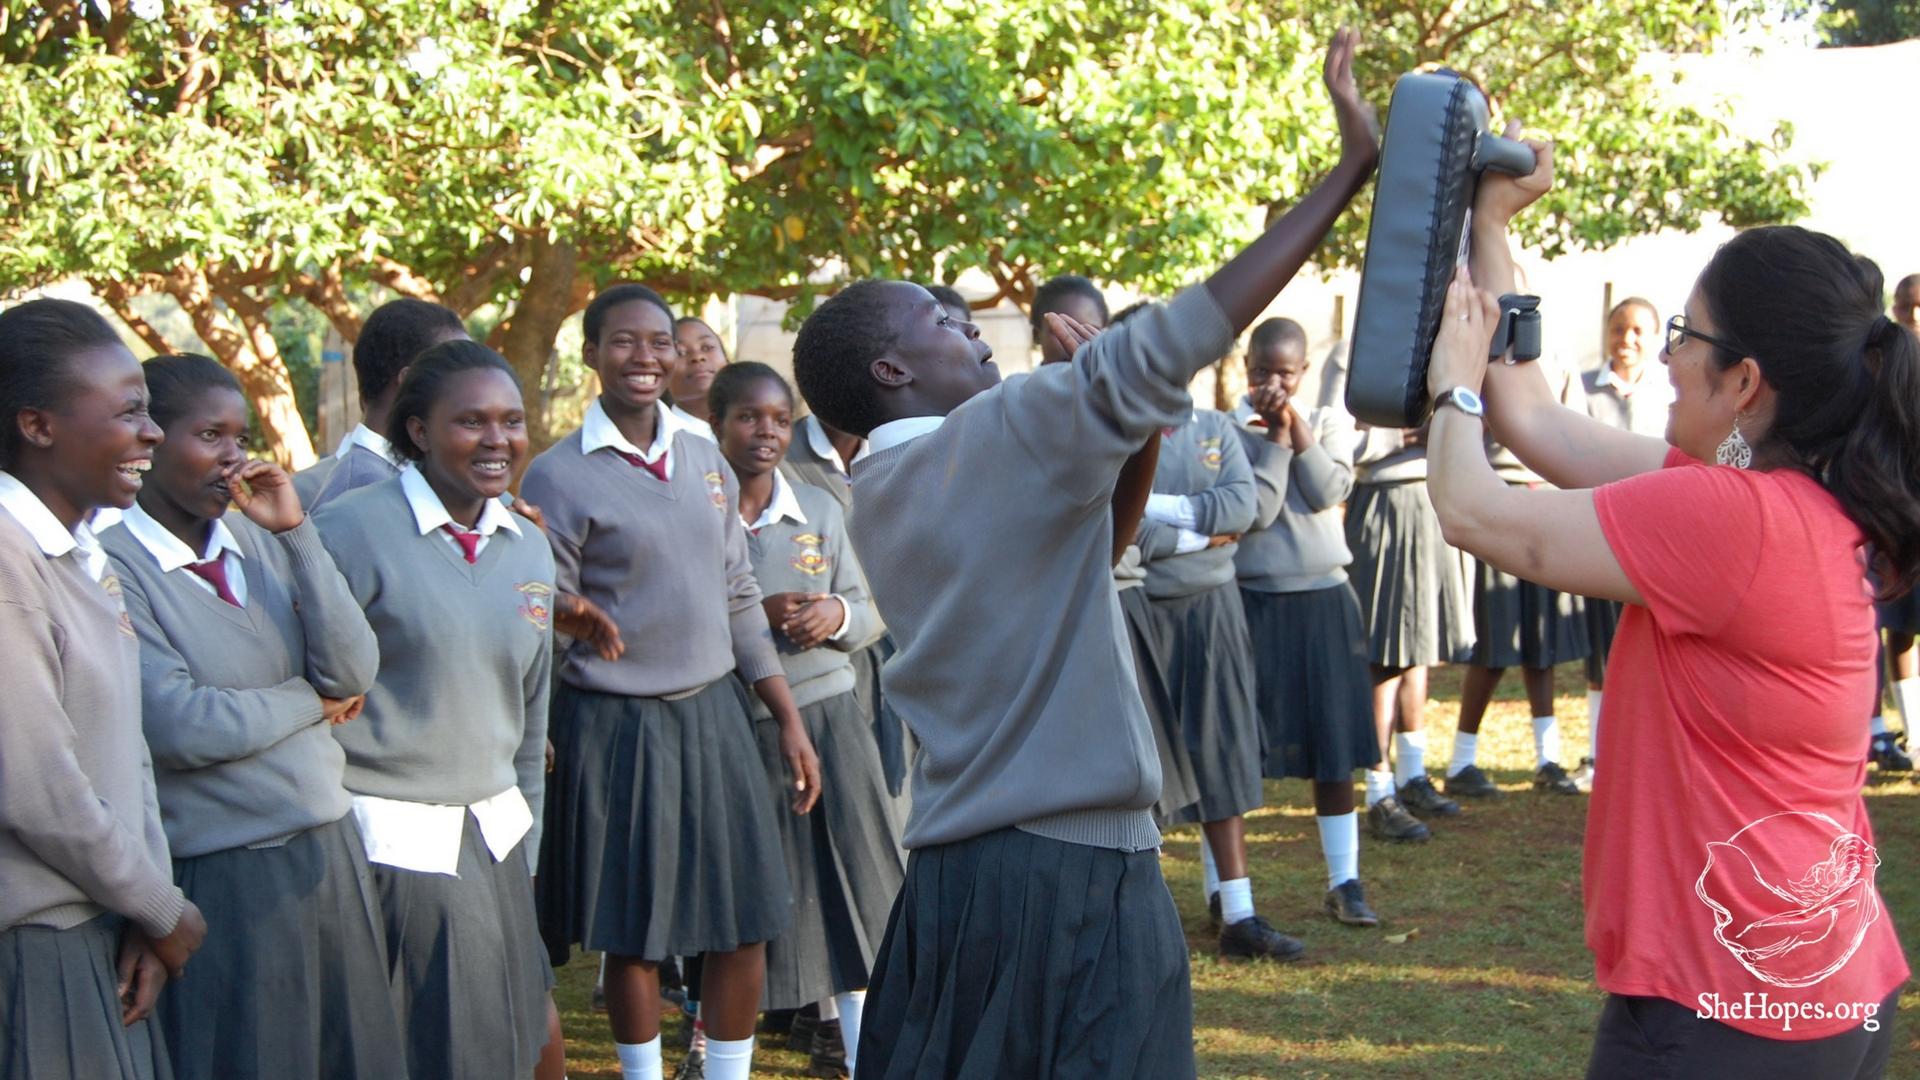 SheHopes.org Kenya Secondary School Nose Hit.jpg